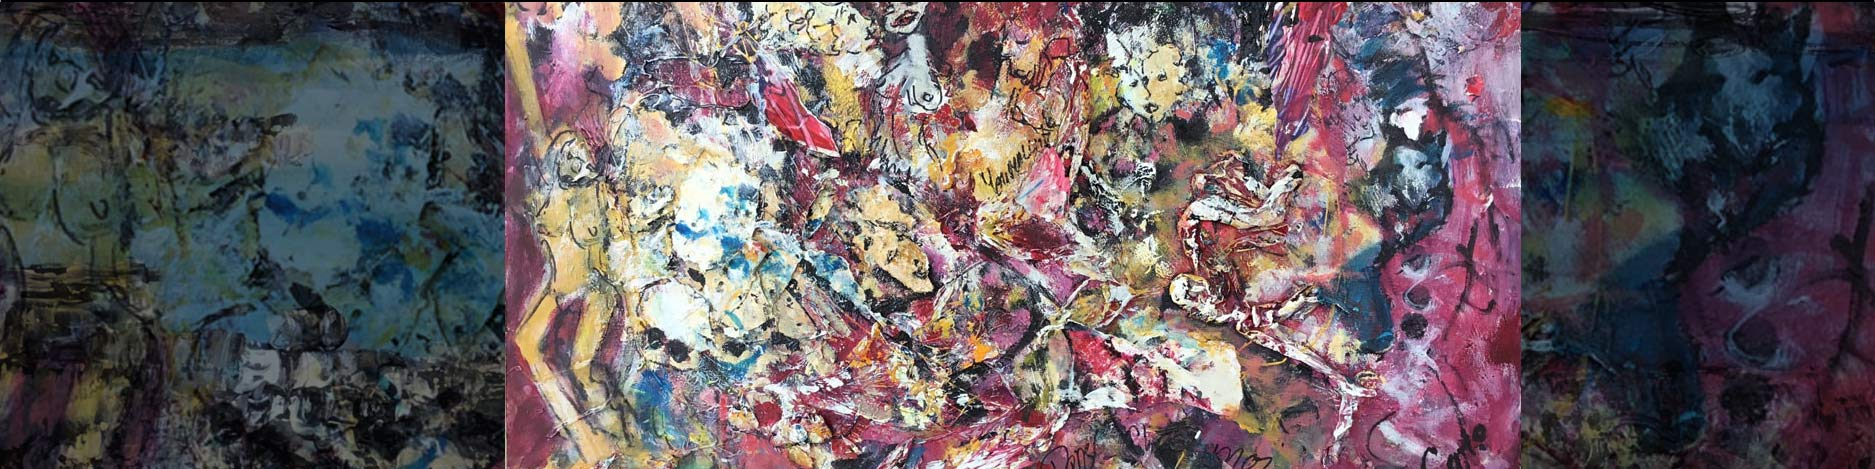 Caroline Fiset - Carof peintre abstraite